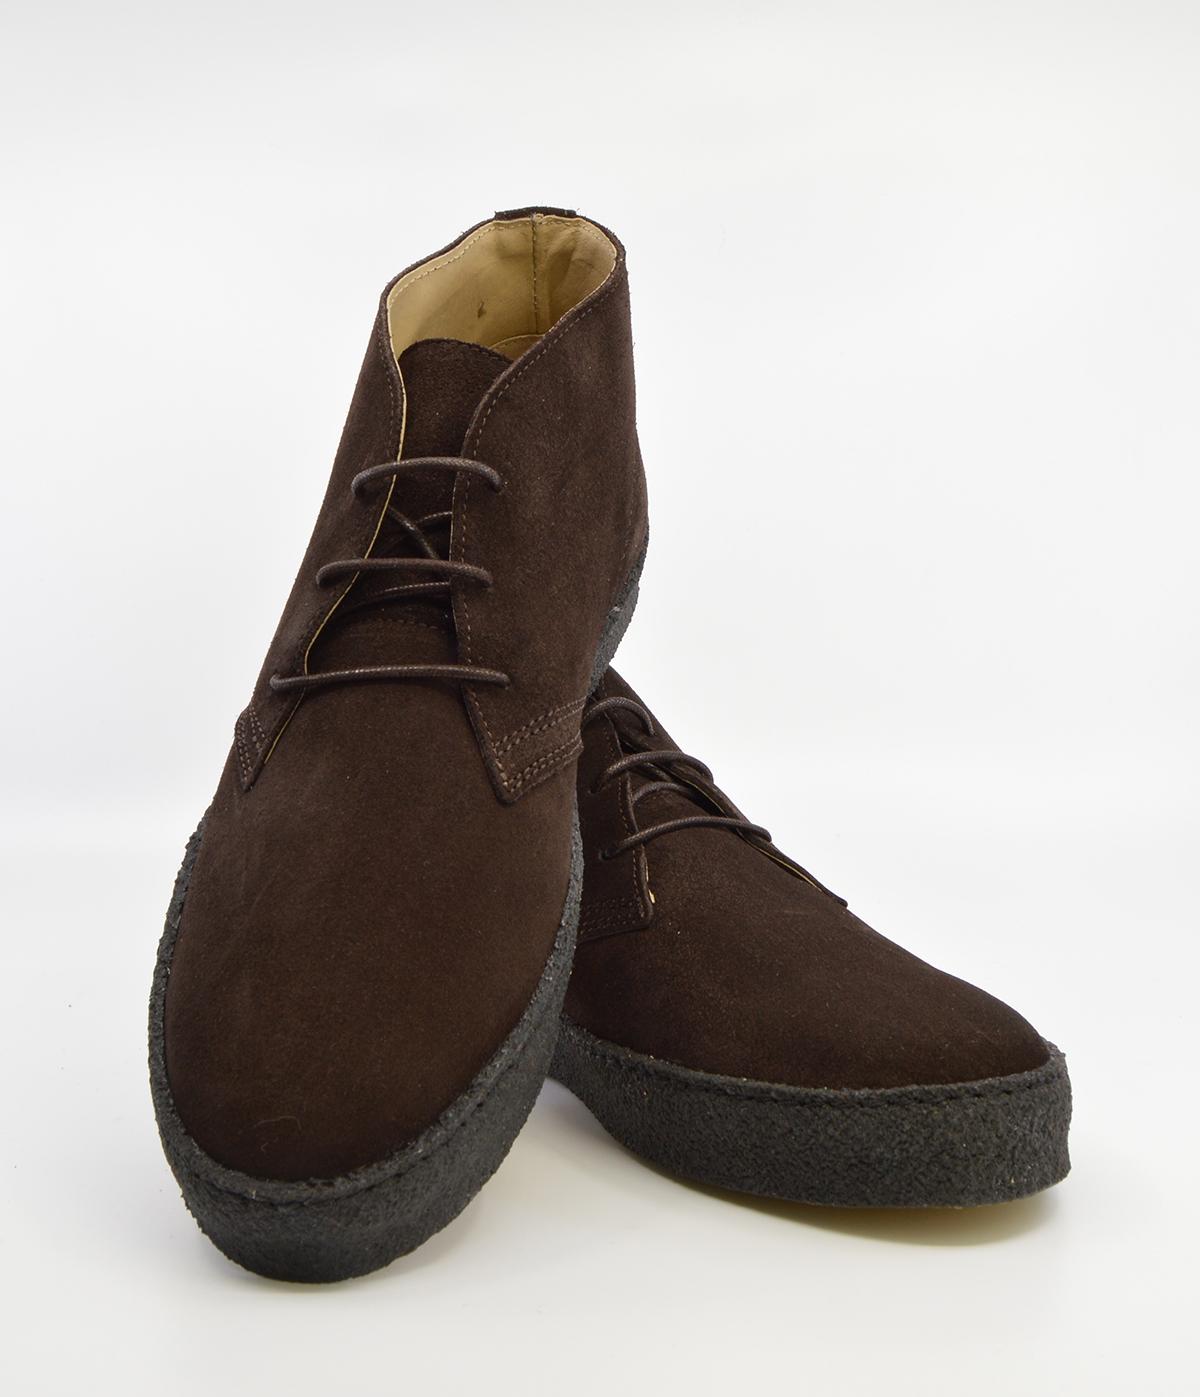 Chukka Boot Dark Brown Suede – The